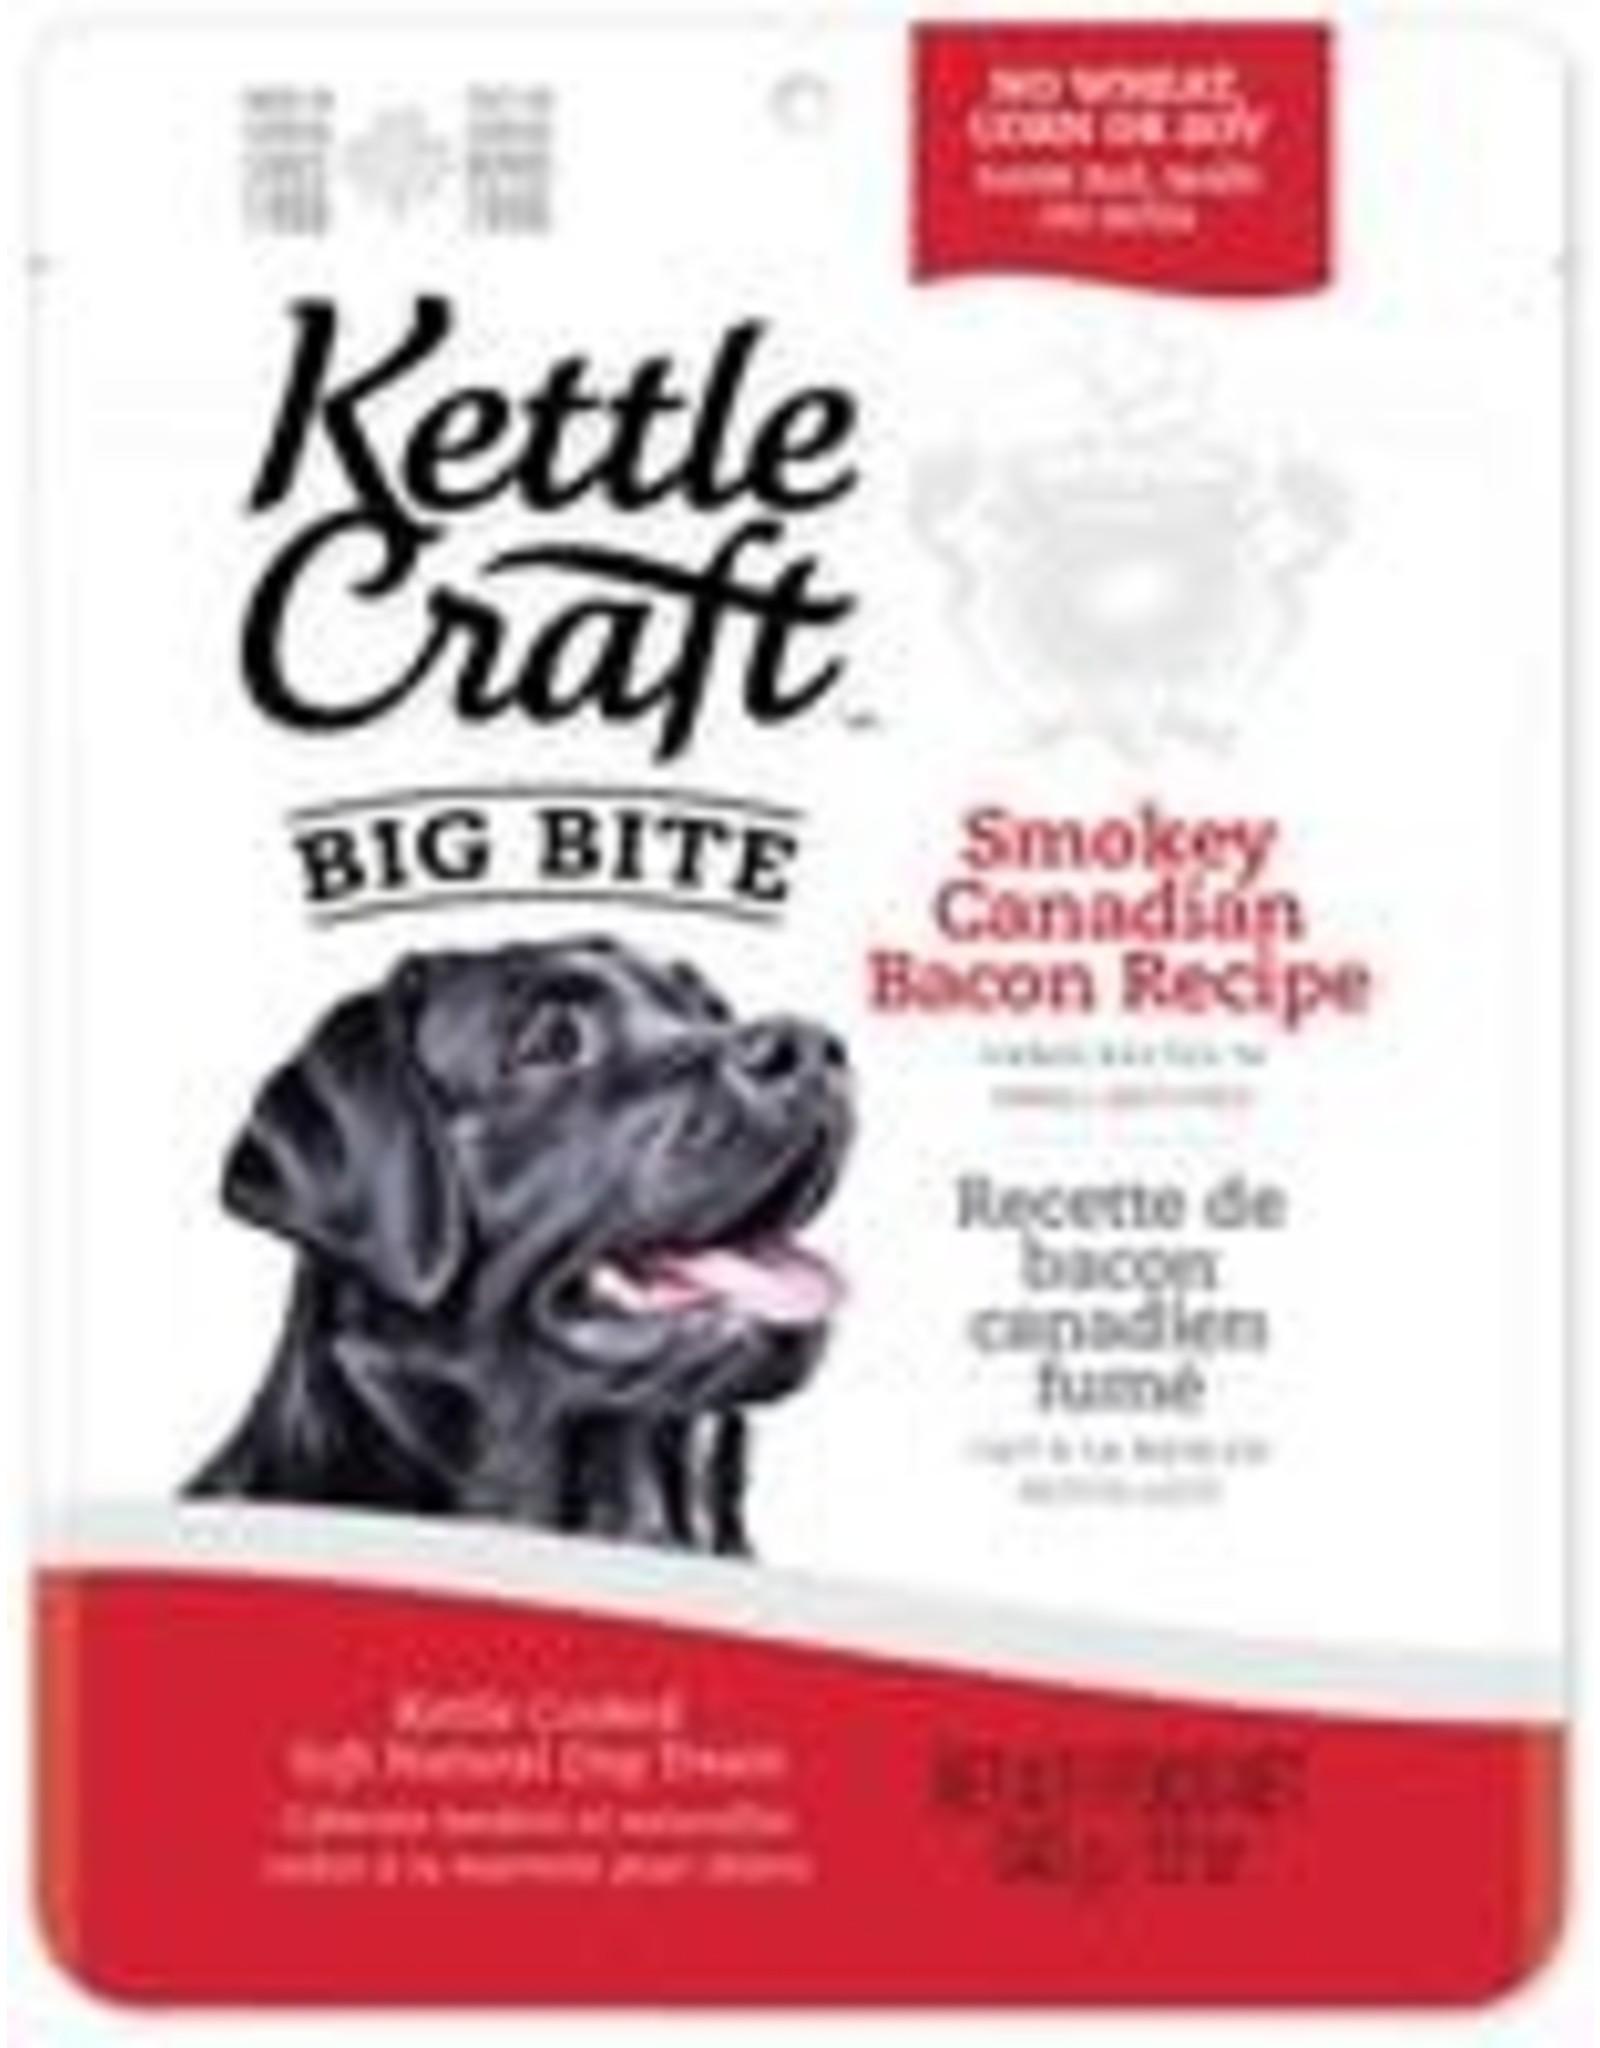 Kettle Craft K.C. Dog - Smokey Canadian Bacon - big bite 340g